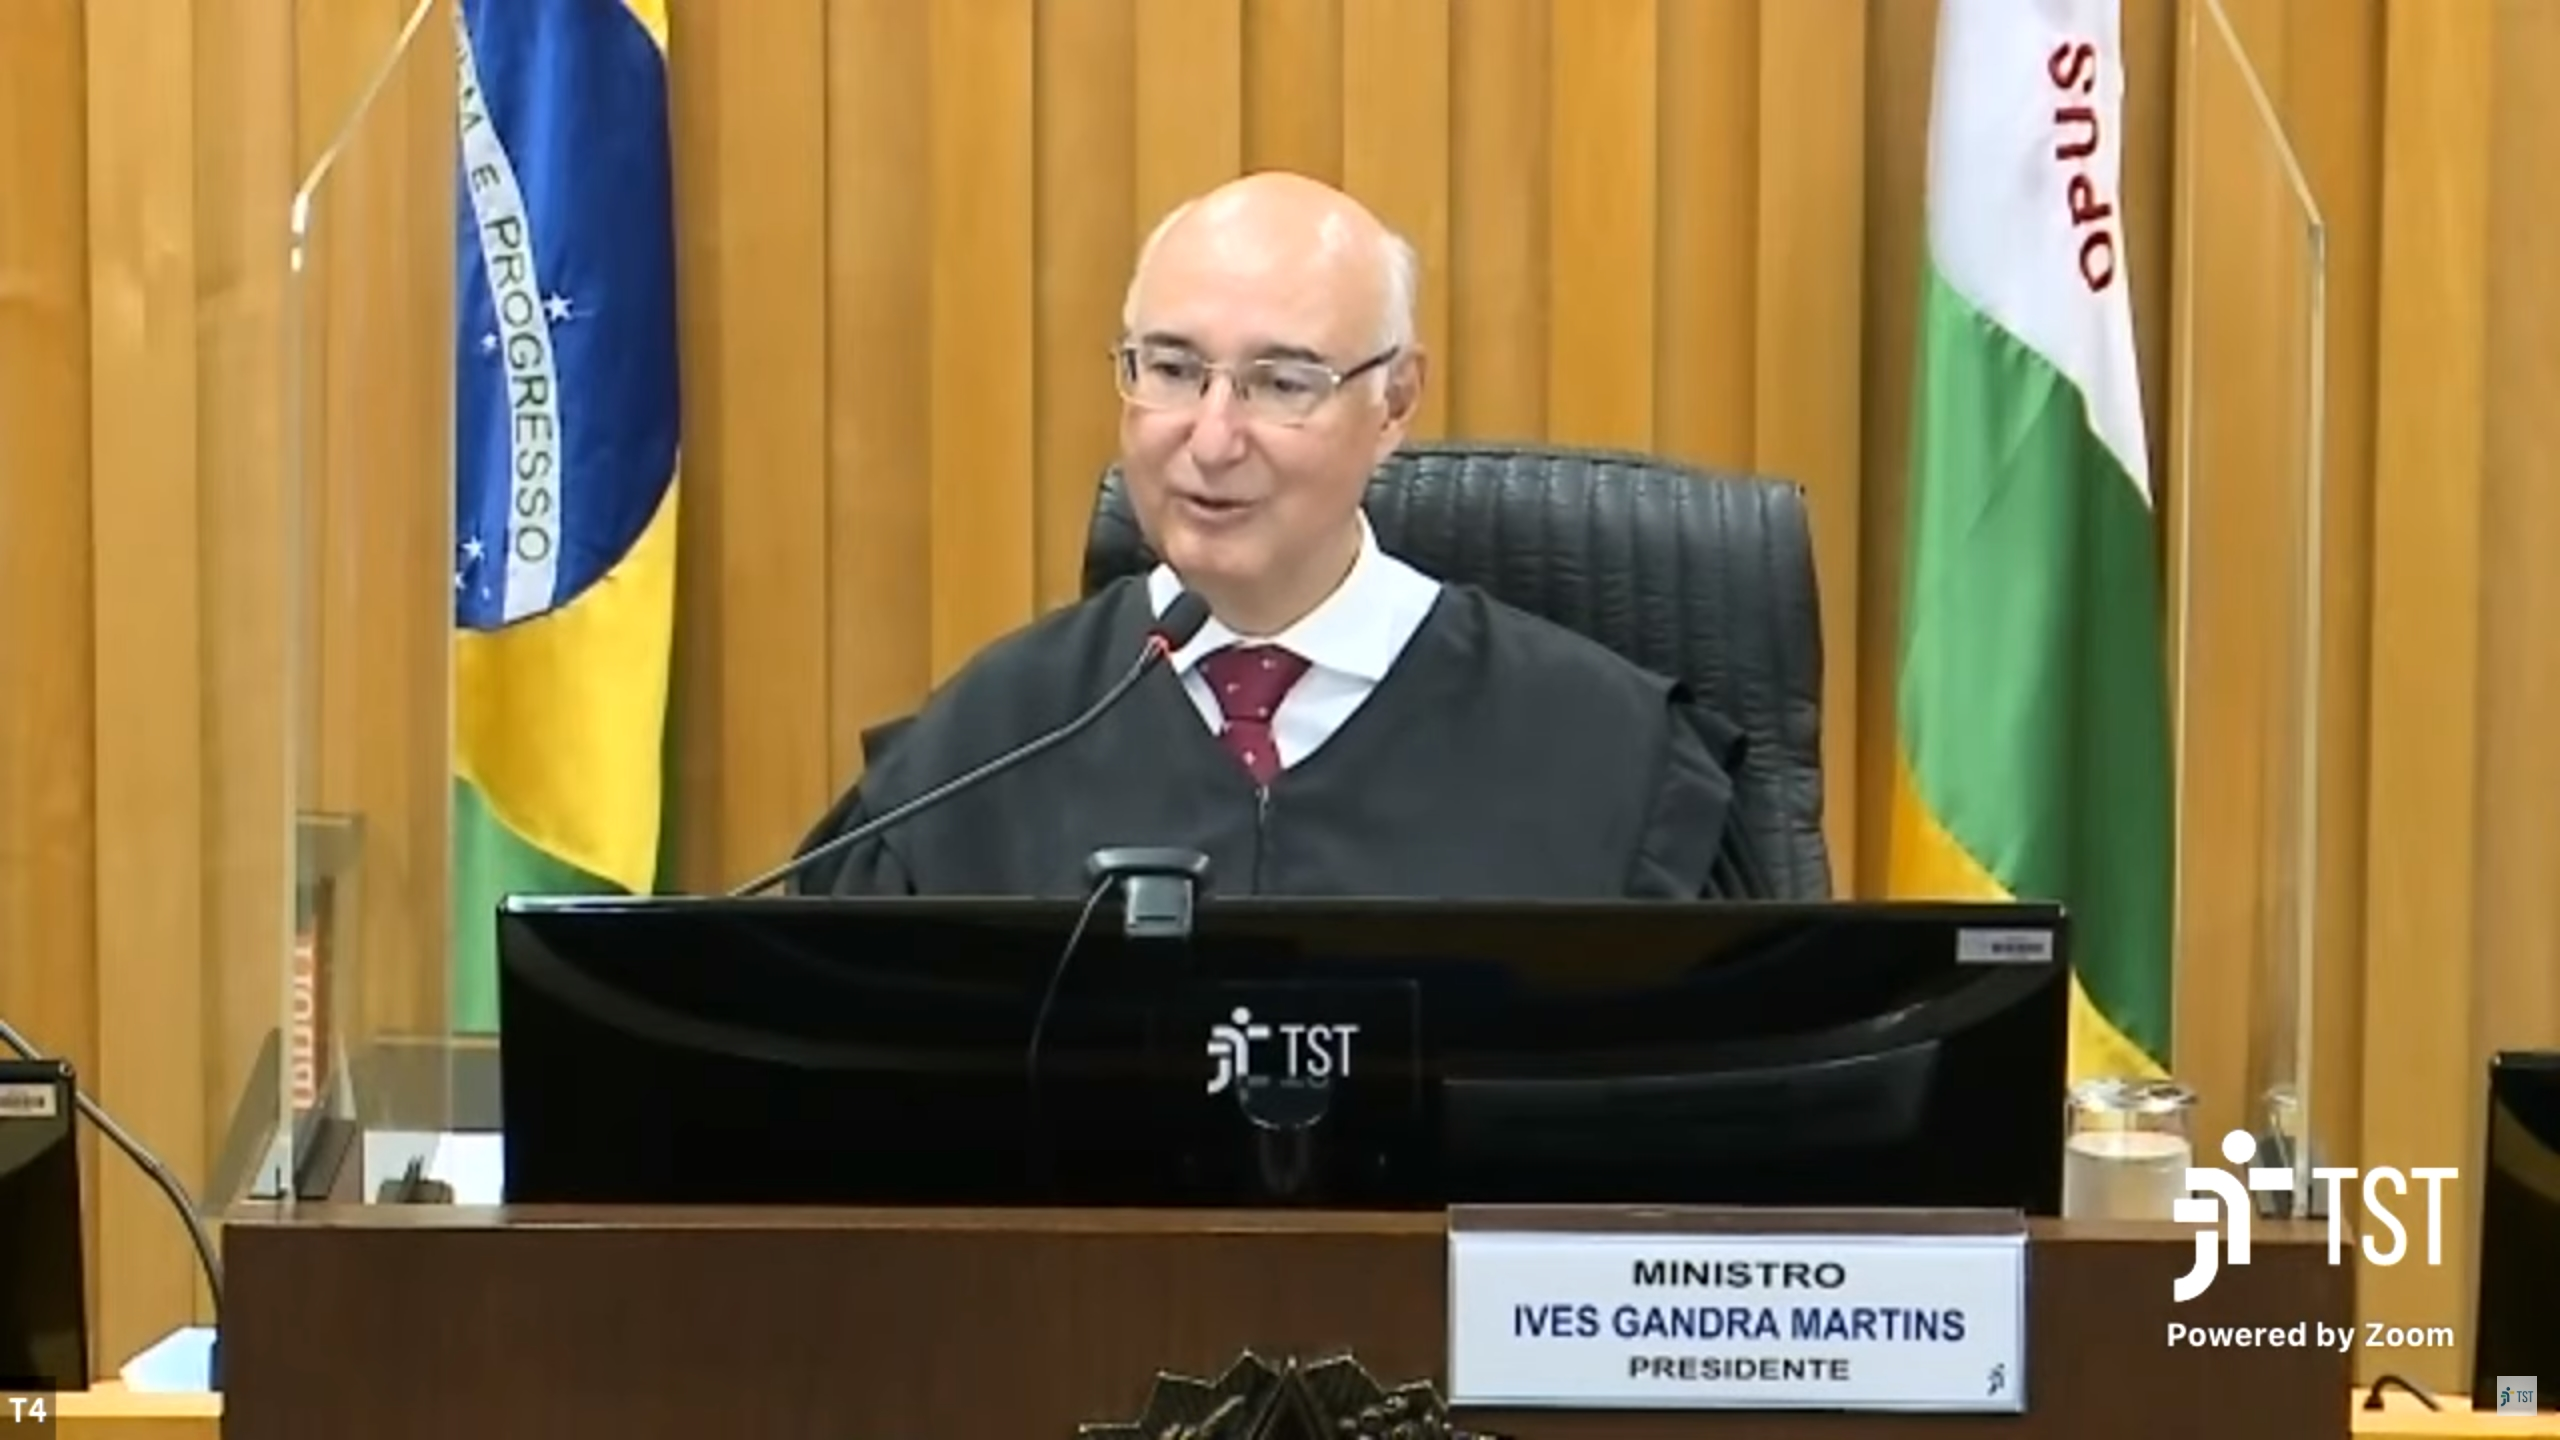 Ministro Ives Gandra Filho, presidente da 4ª Turma, em sessão híbrida